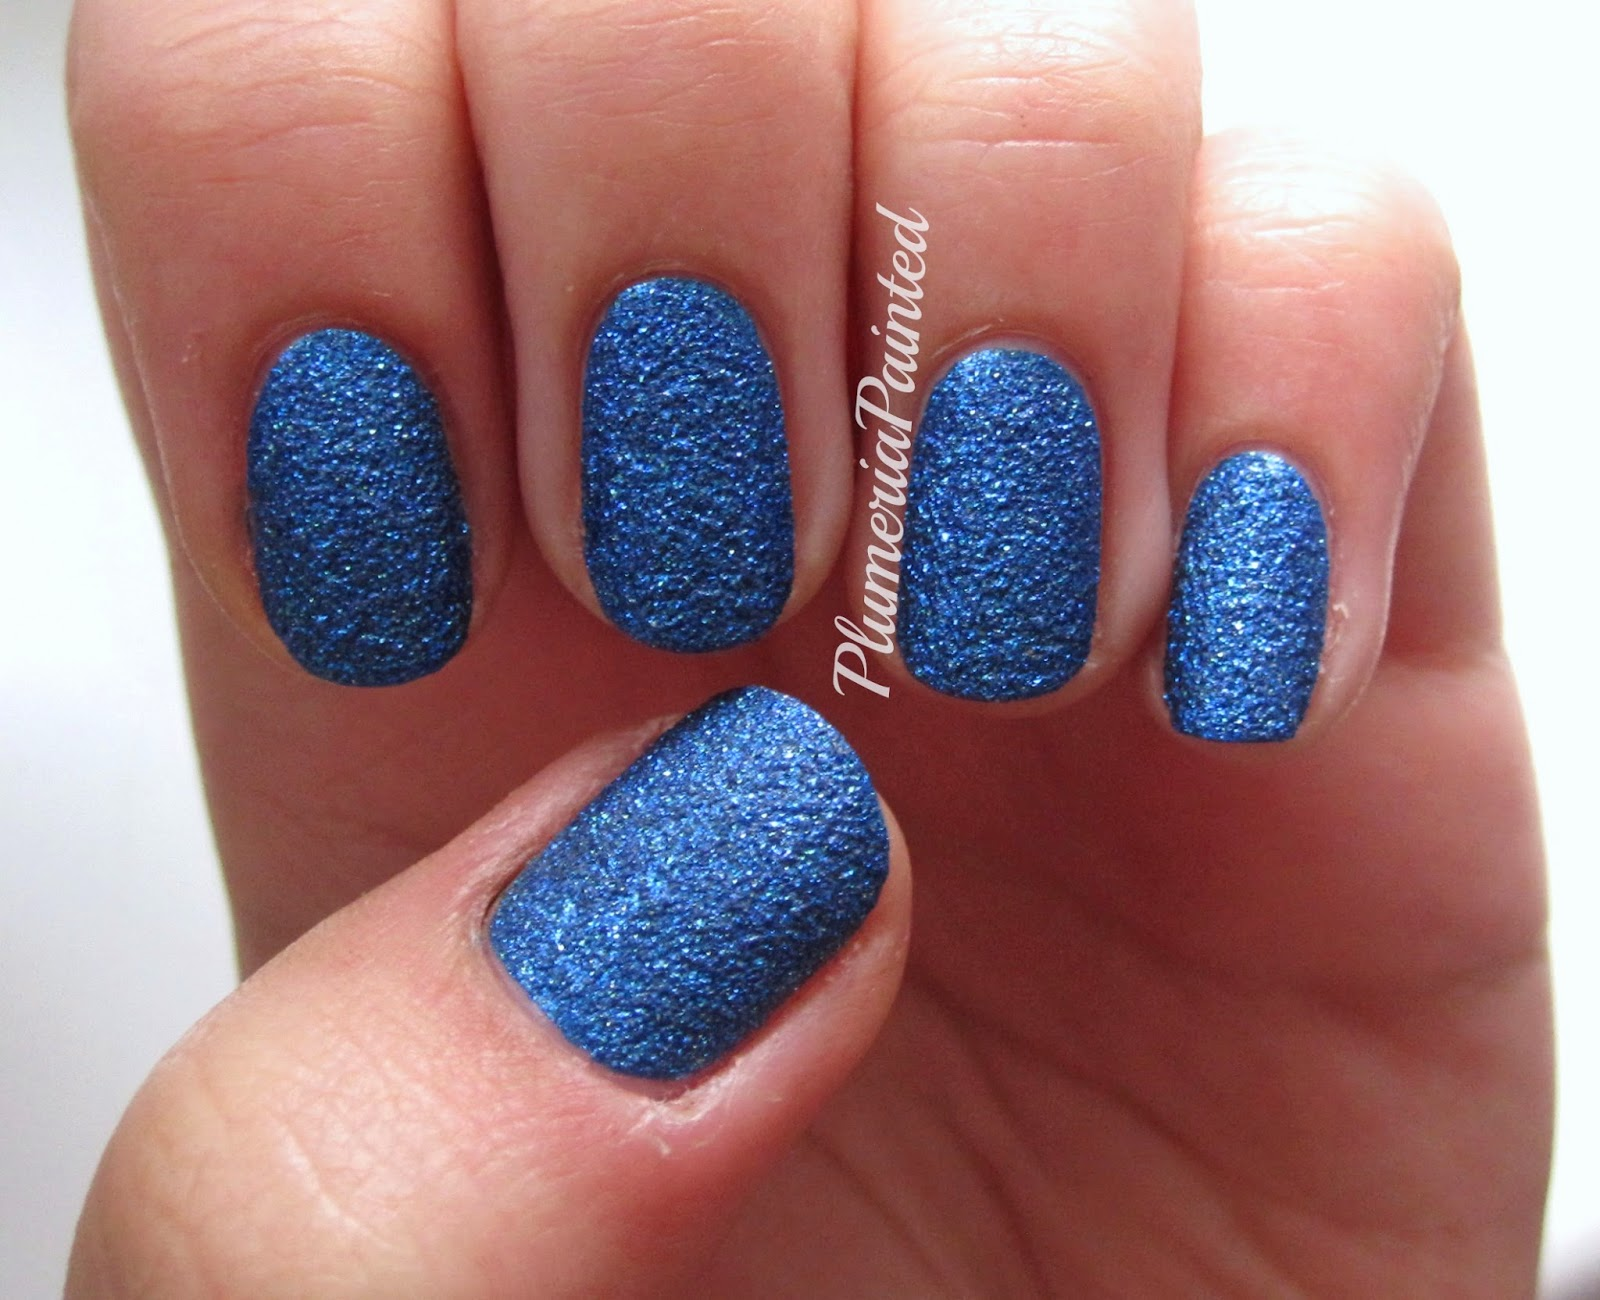 PlumeriaPainted: Blue Nails: Essie - Lots of Lux